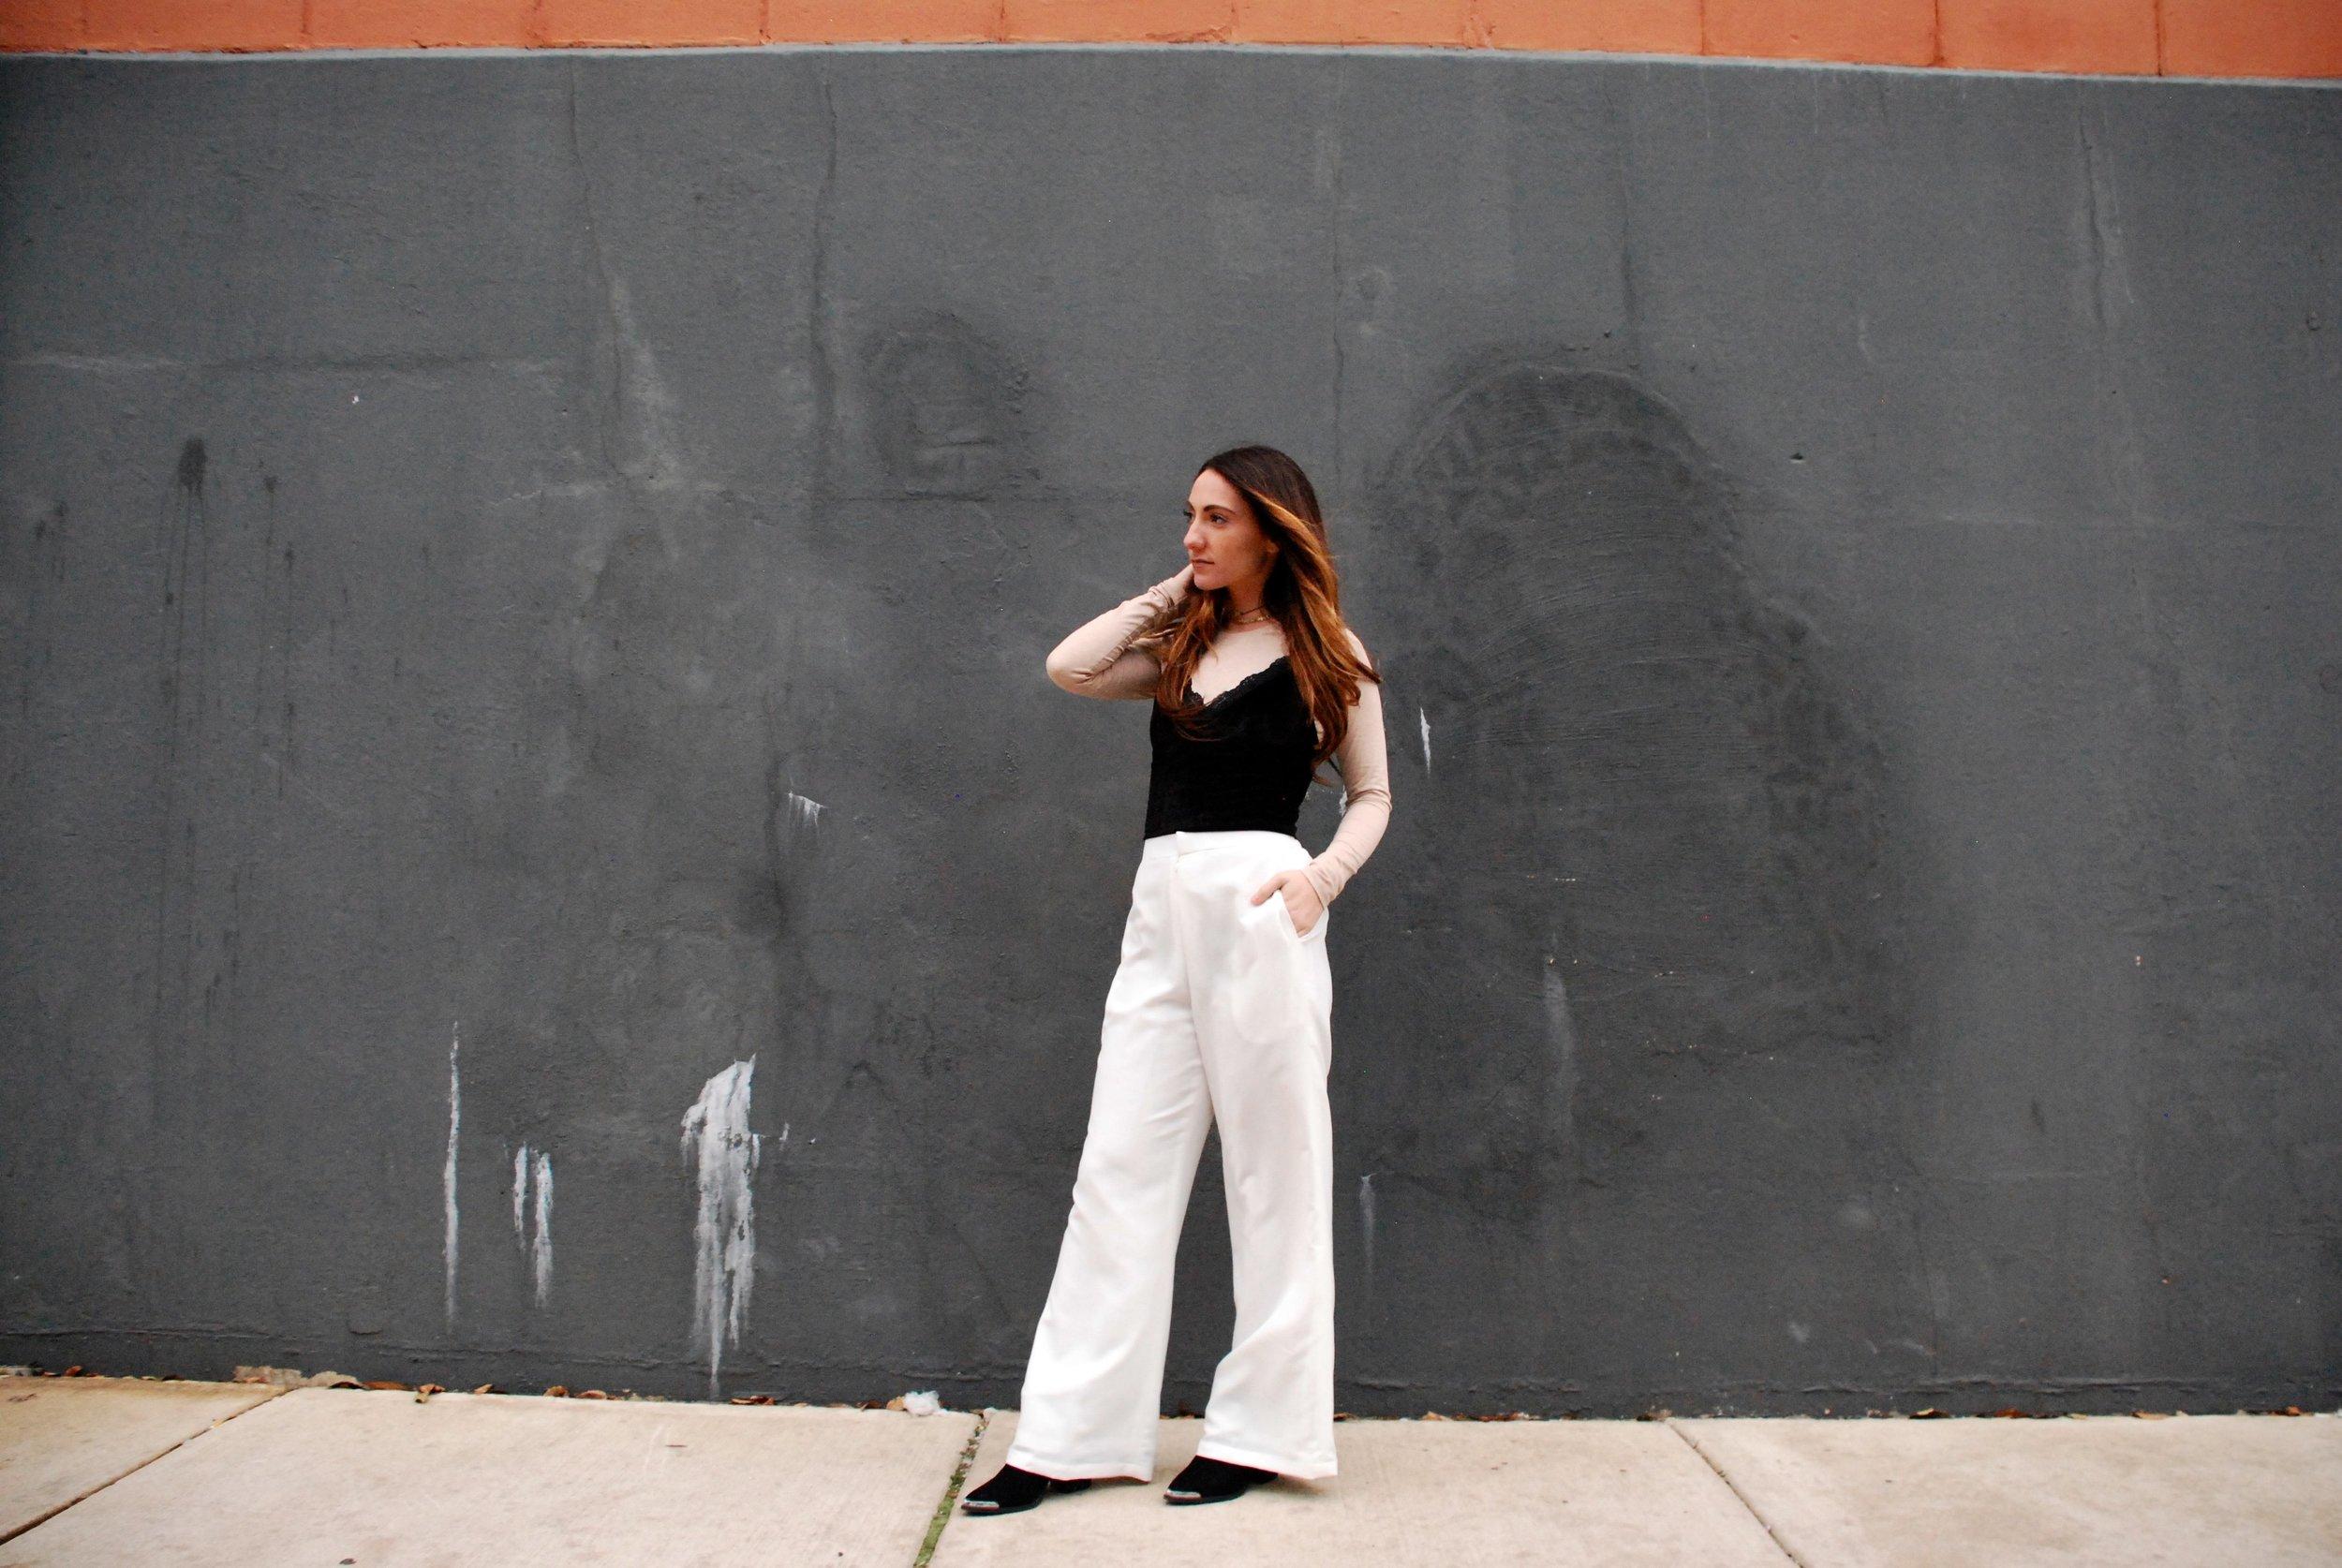 Influencer, Blogger, and Jewlery Designer Meg of Honest21 Photographed by Sola Onitiri